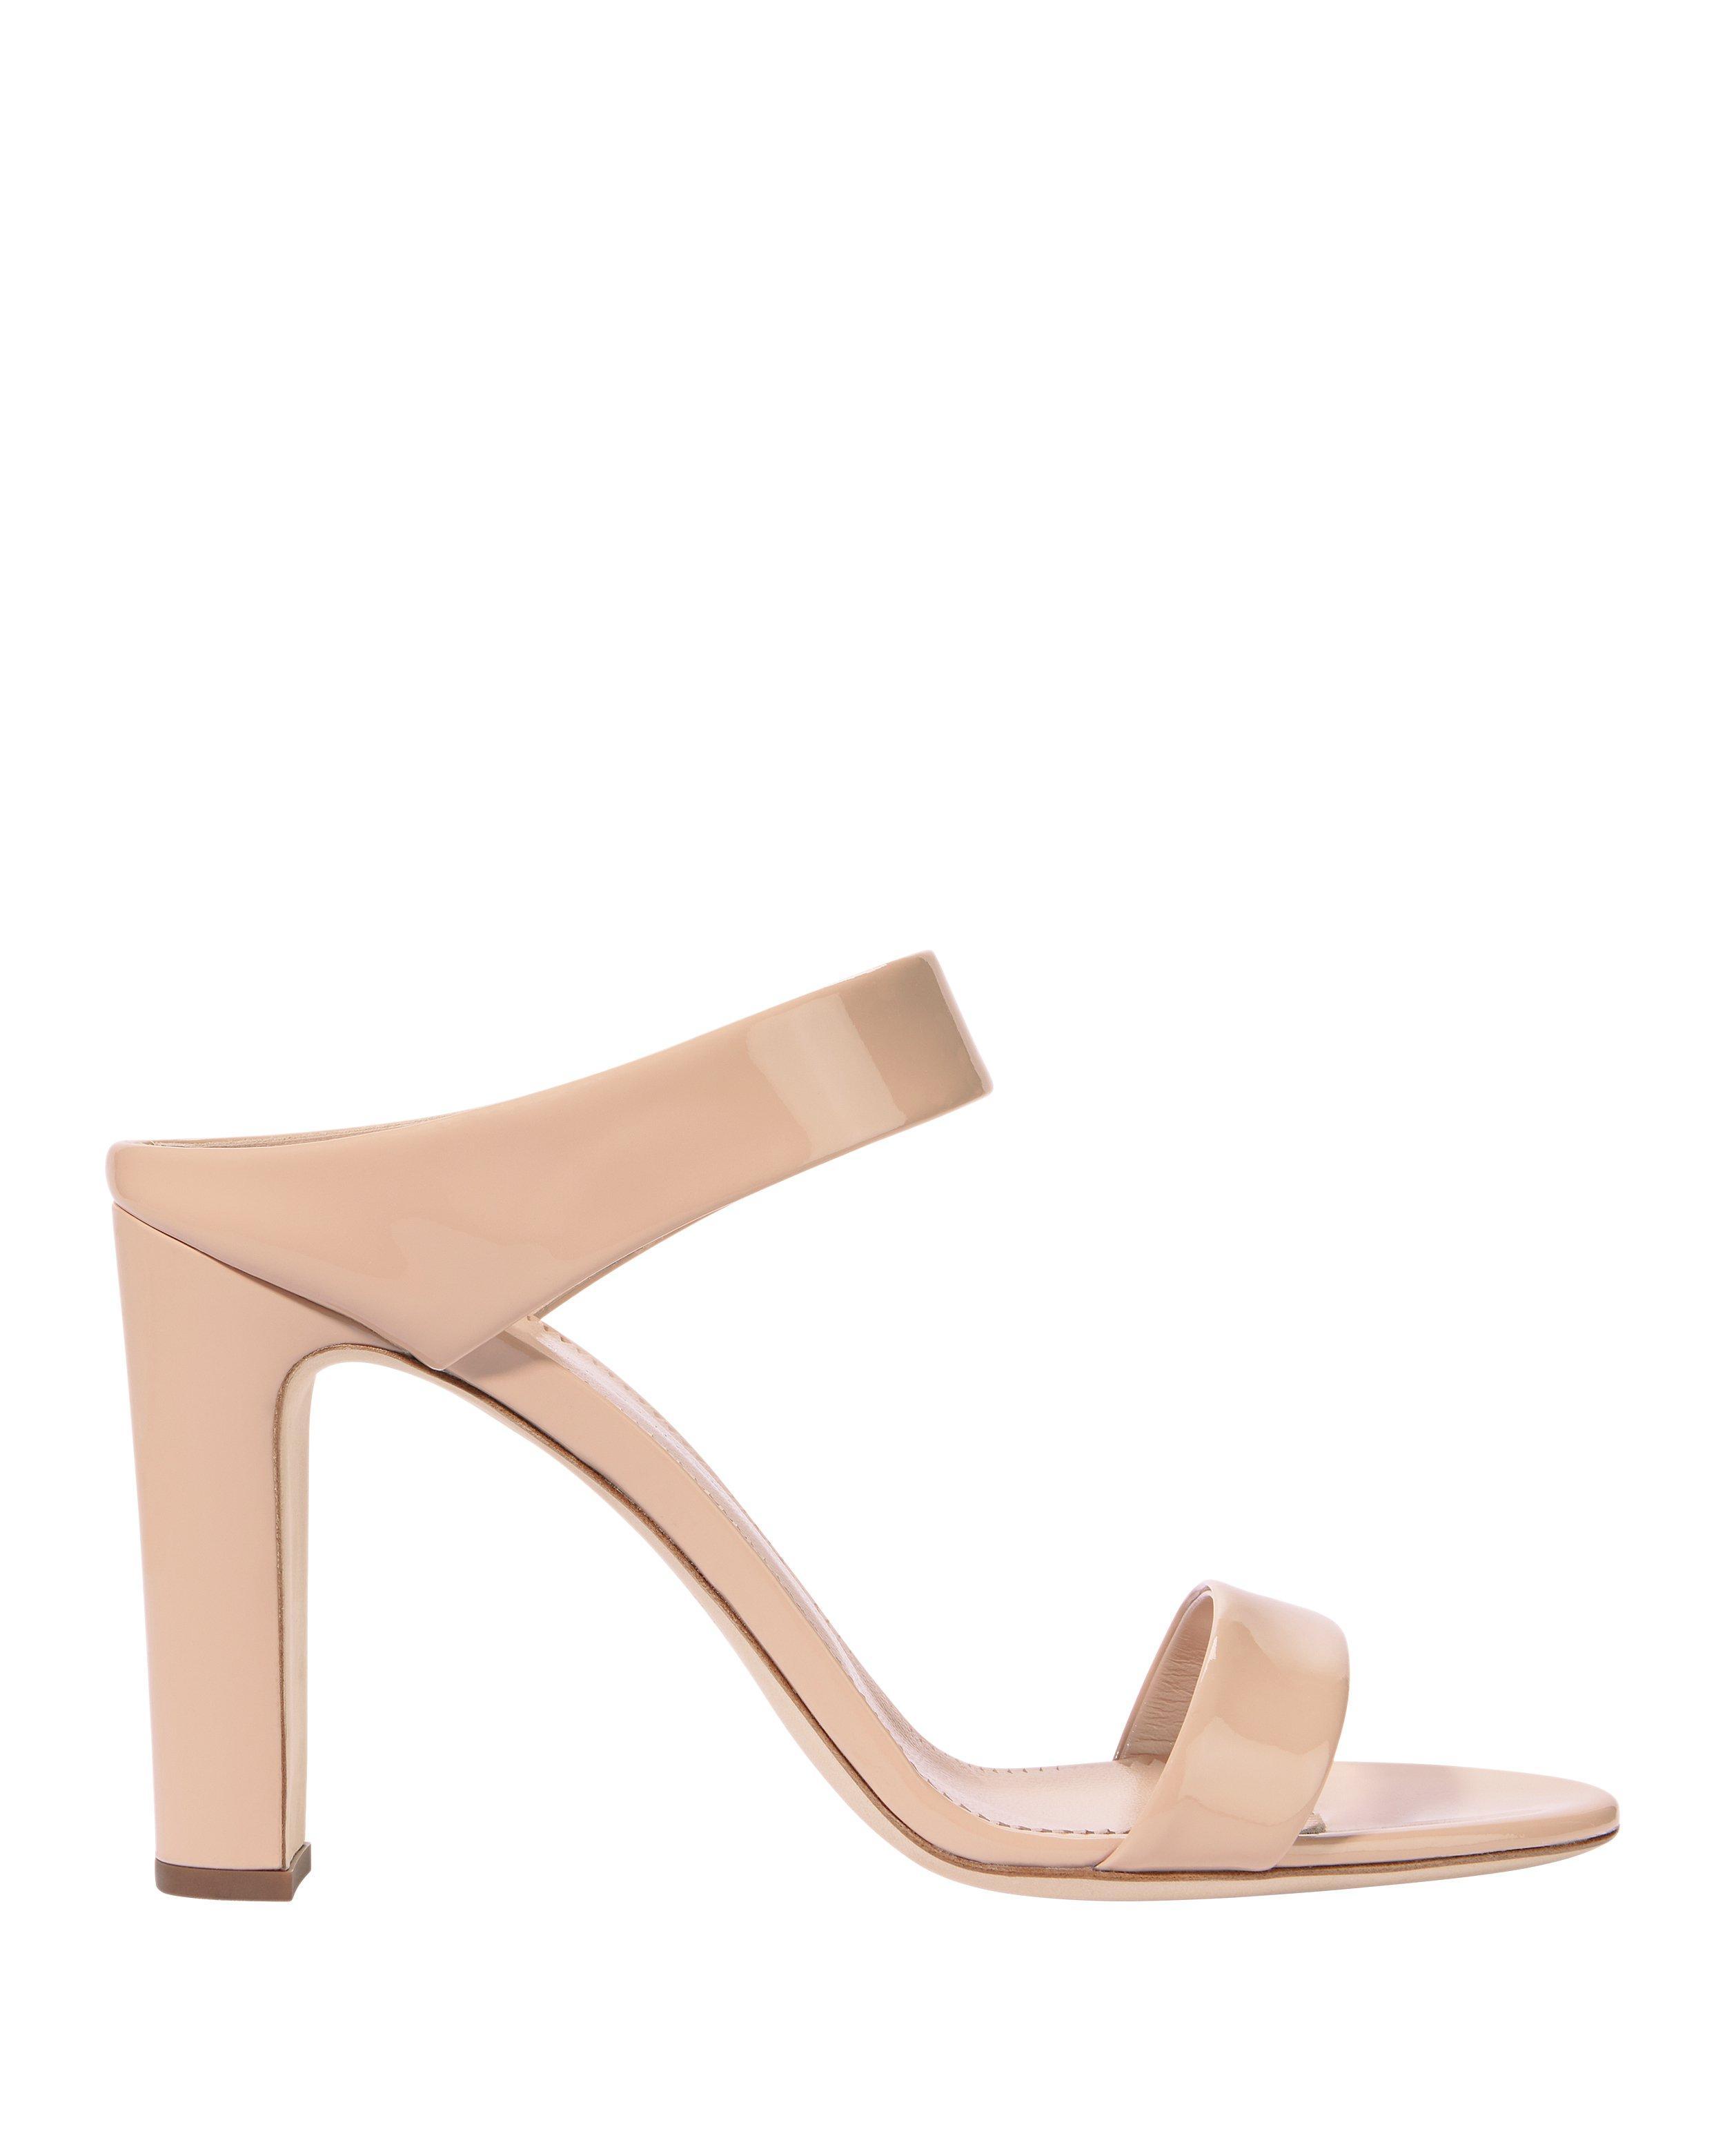 Giuseppe Zanotti Alien Double Strap Nude High Sandals